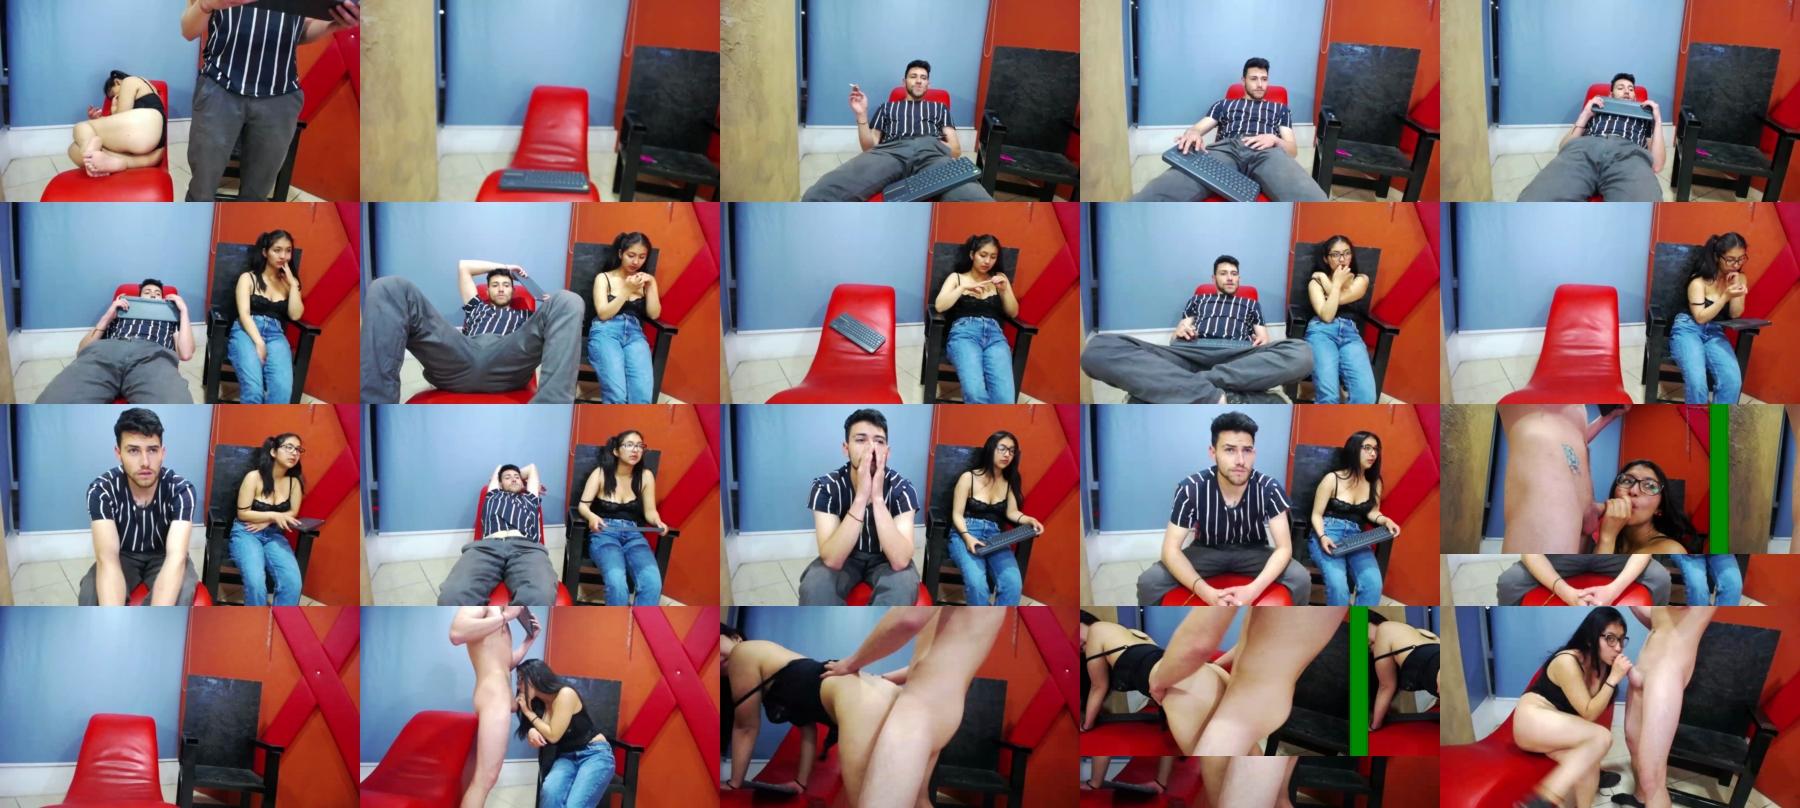 Roxxane_Dereck Cam4 28-07-2021 Recorded Video Topless